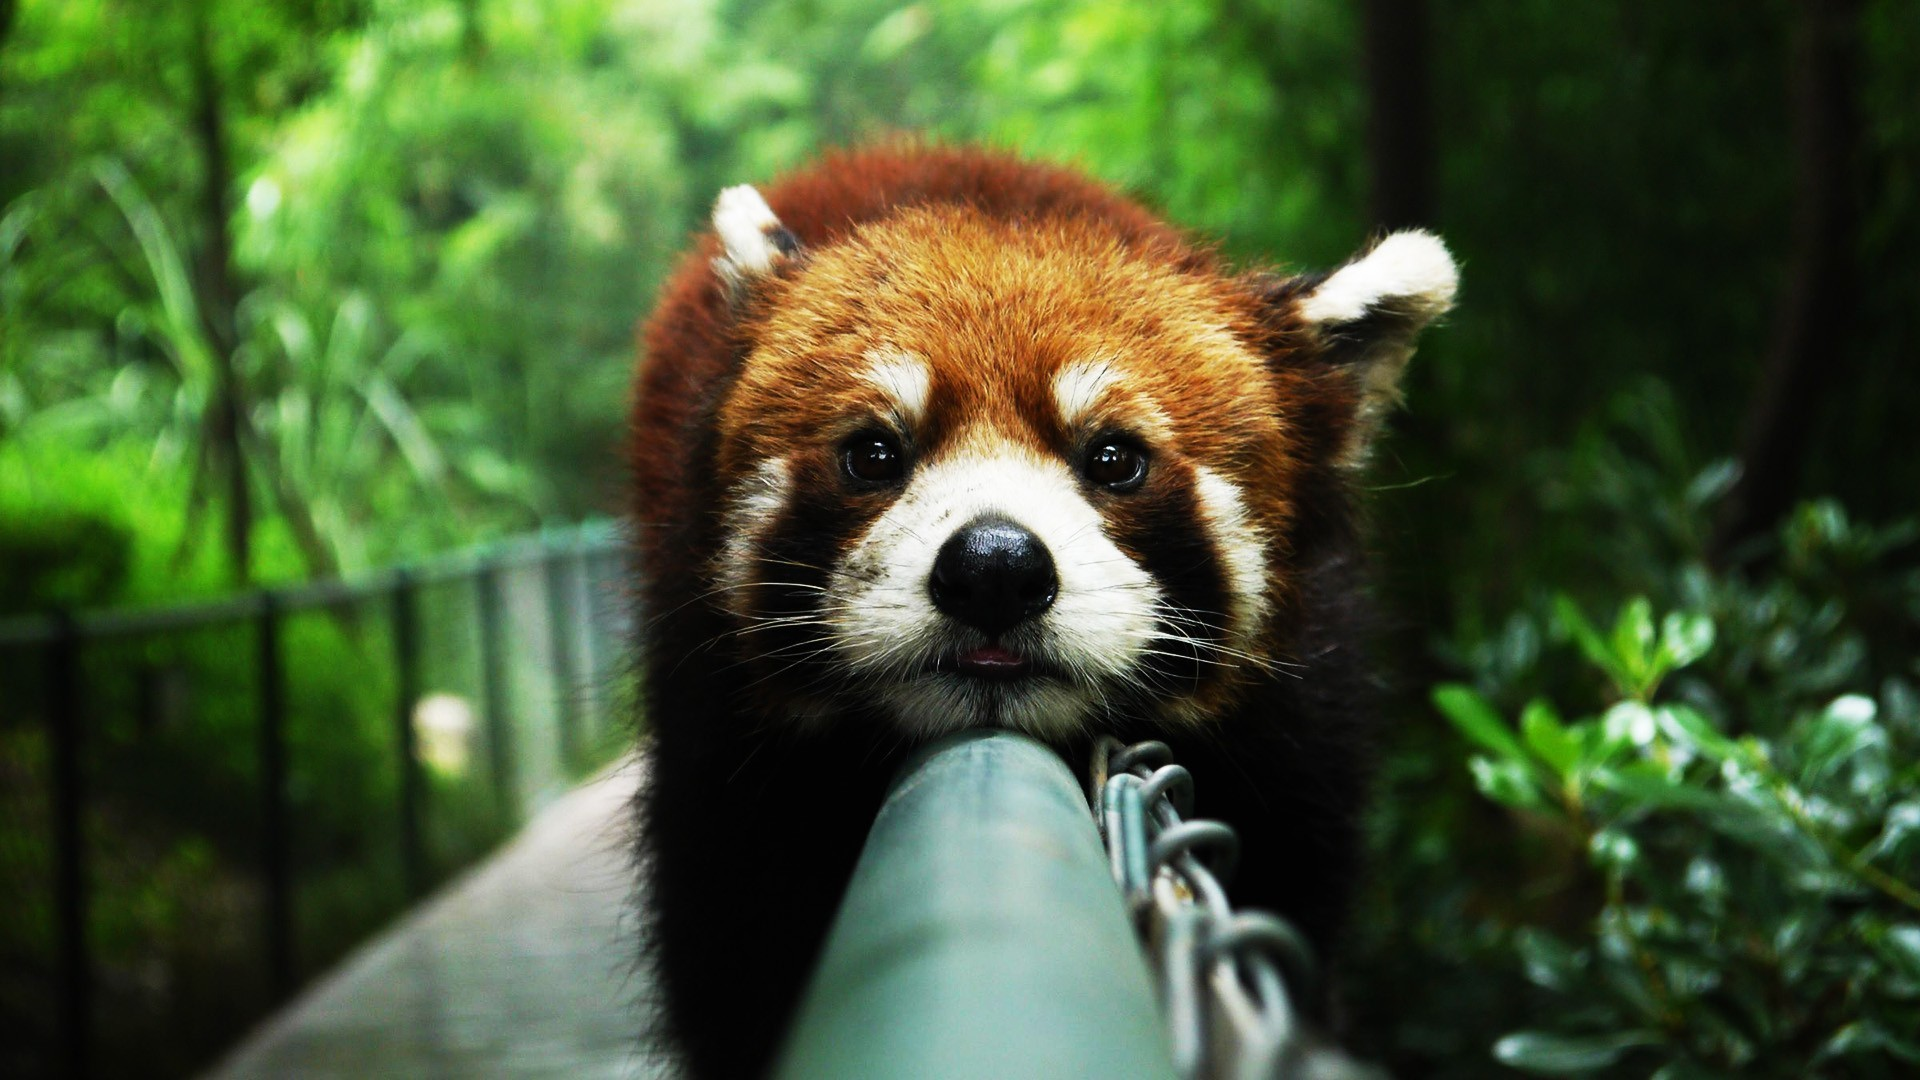 Res: 1920x1080, wallpaperstocknet81cute red panda wallpapers 36328 jpg